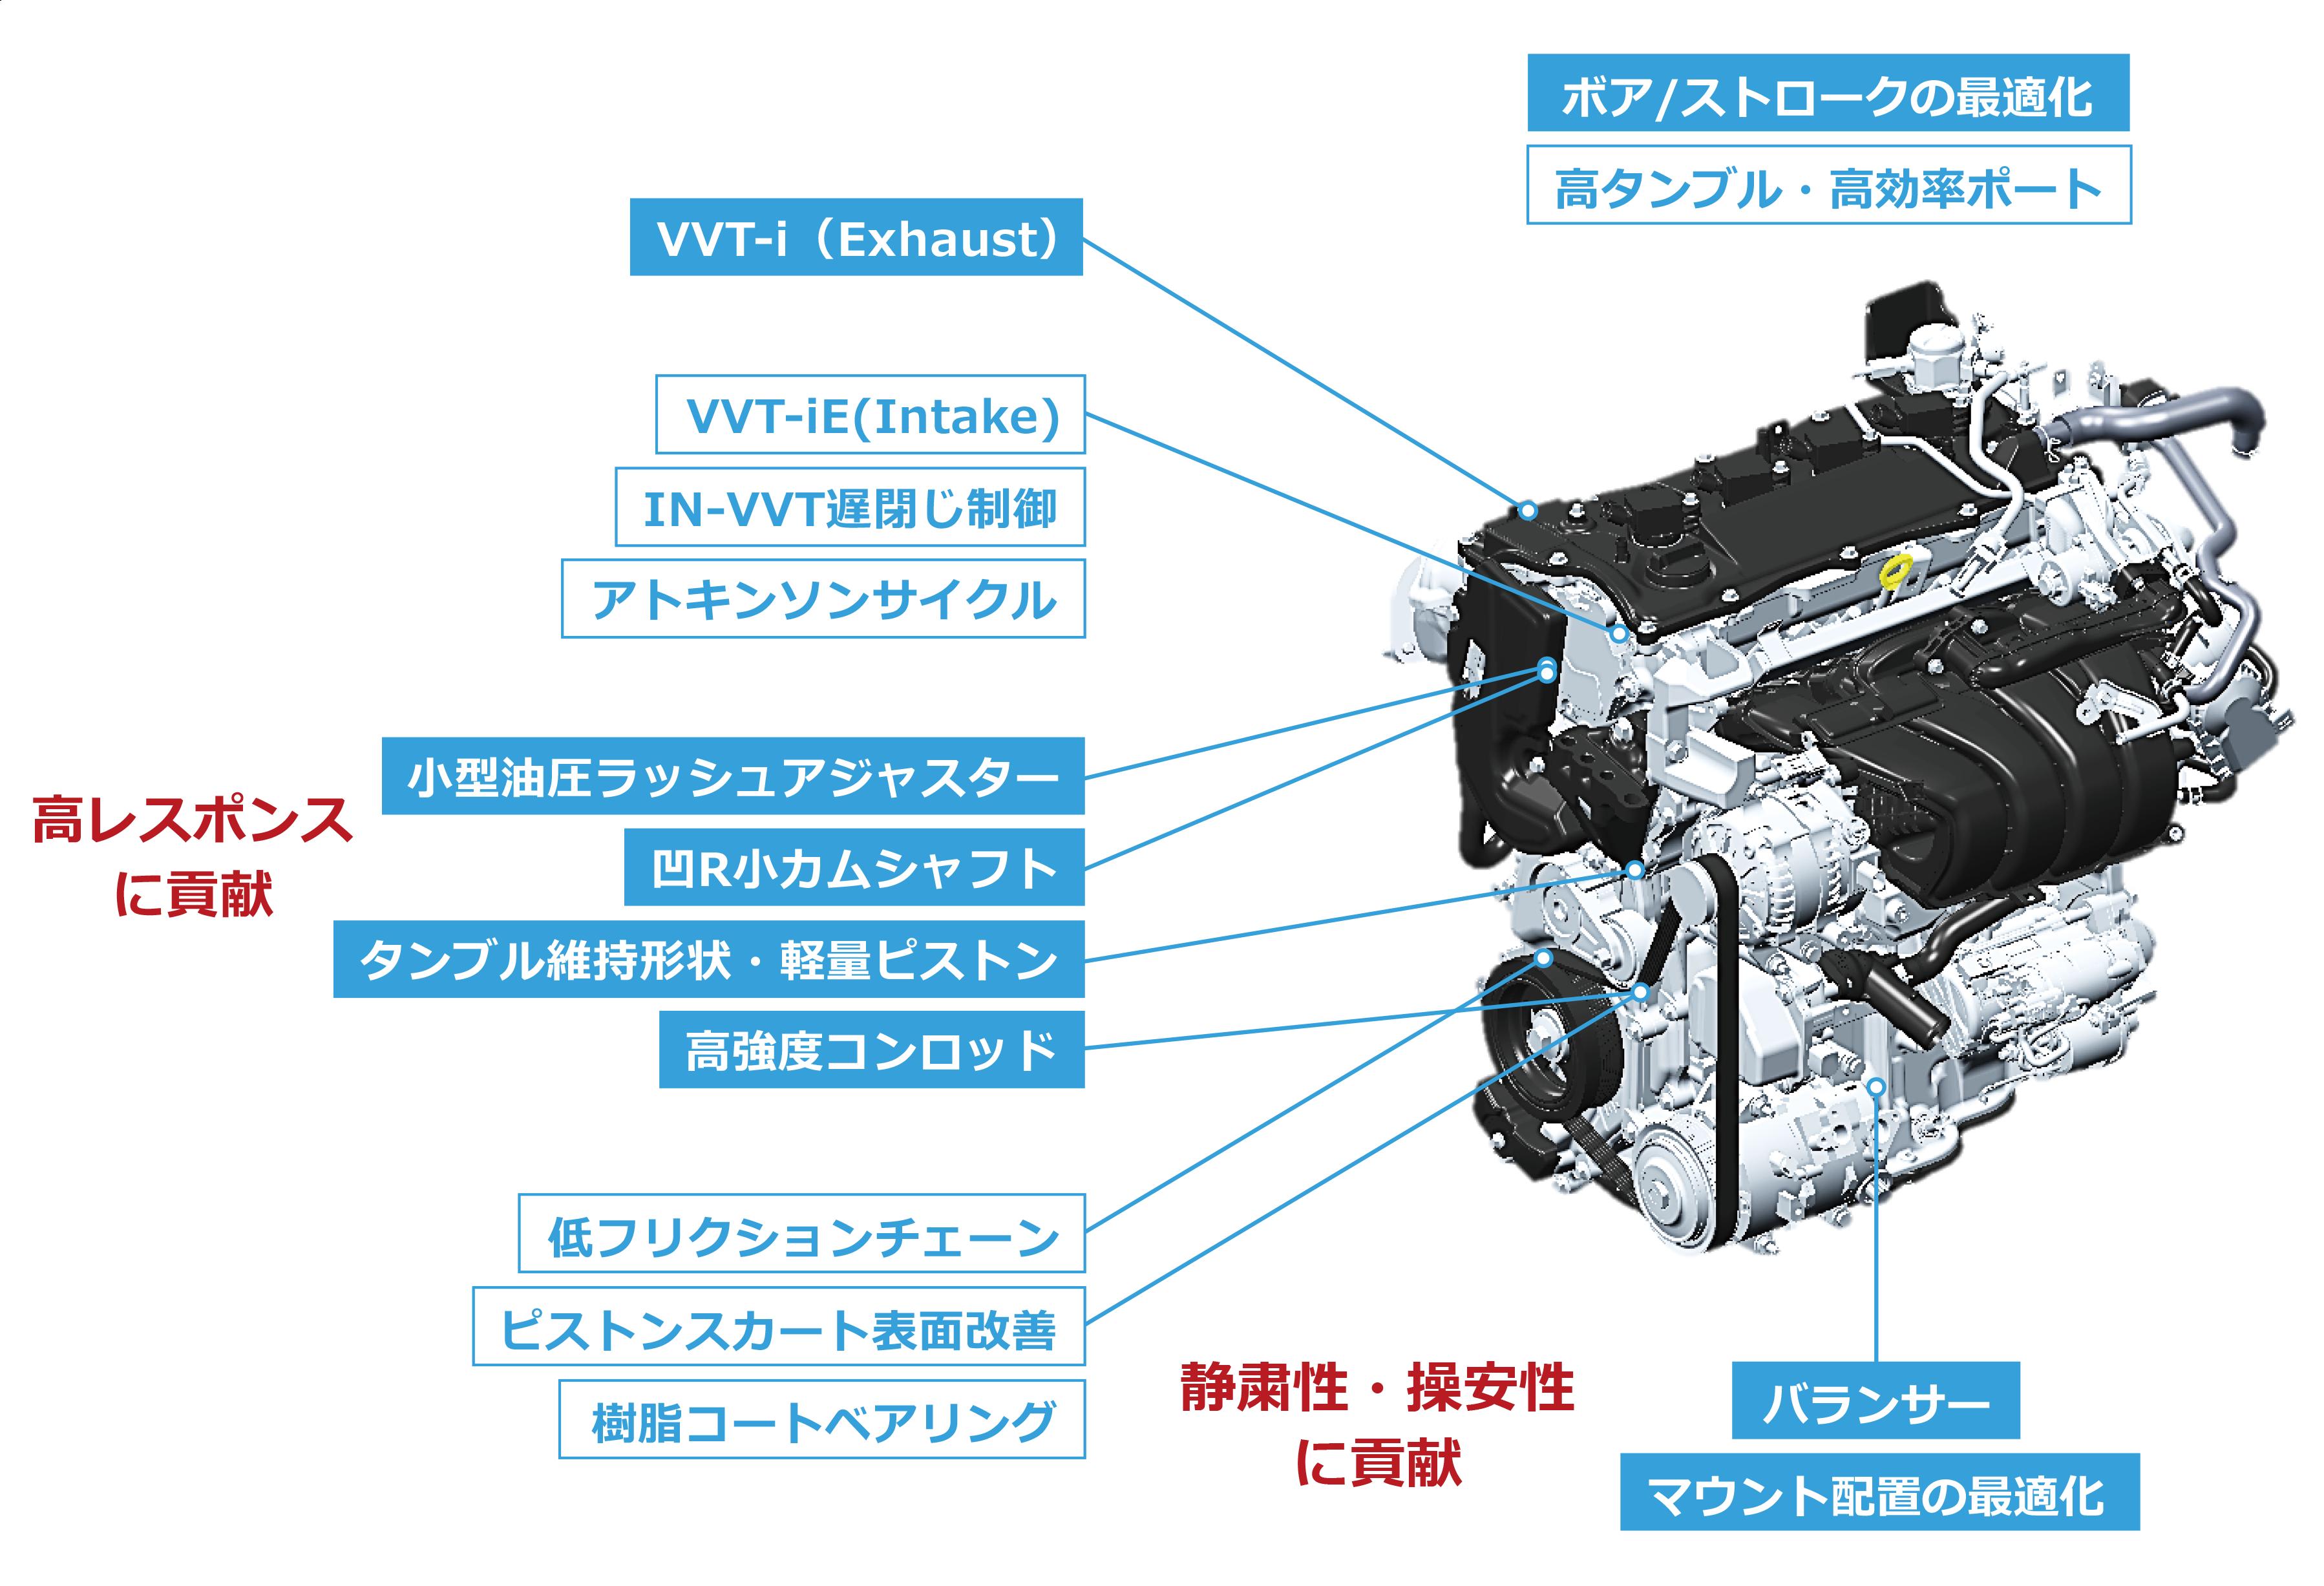 Ɩ�型「直列4気筒2 5l直噴エンジン」 Dynamic Force Engine Ã�ヨタグローバルニュースルーム